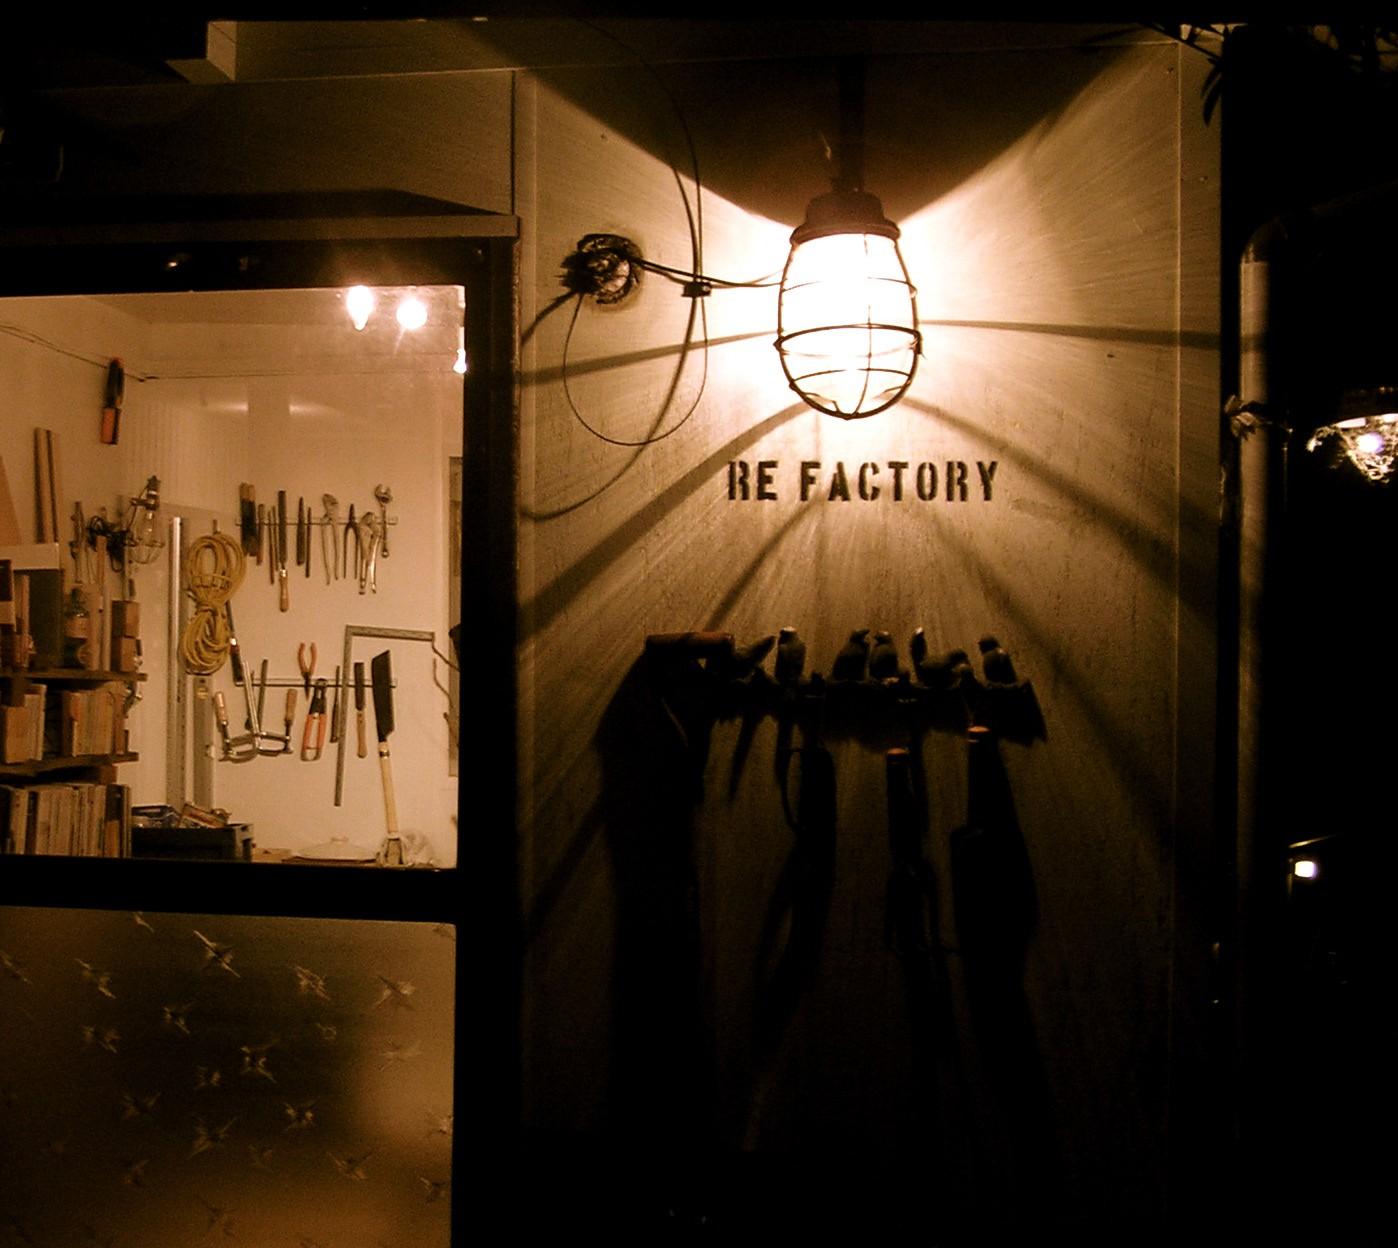 REFACTORYantiques,アトリエ,工業ライト,船舶ライト,古道具